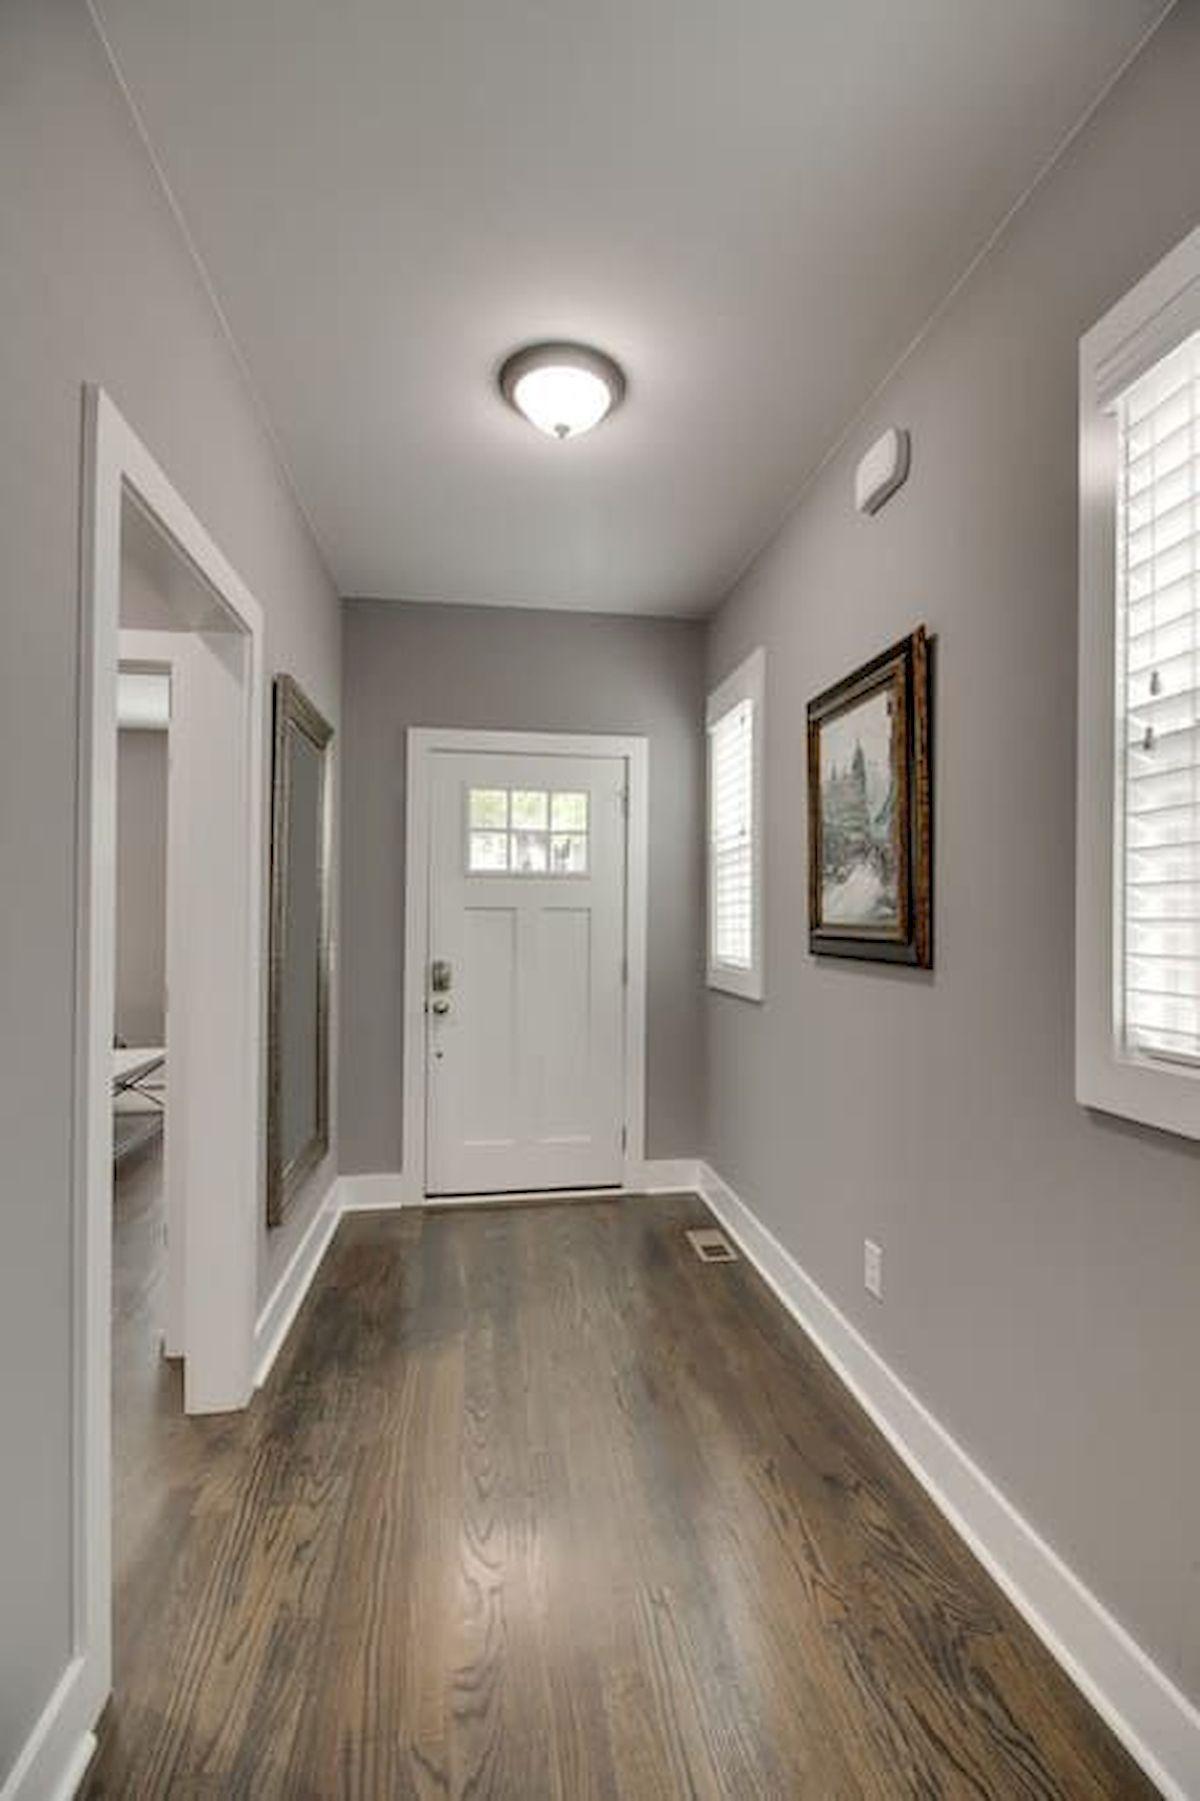 80 Gorgeous Hardwood Floor Ideas for Interior Home (69)